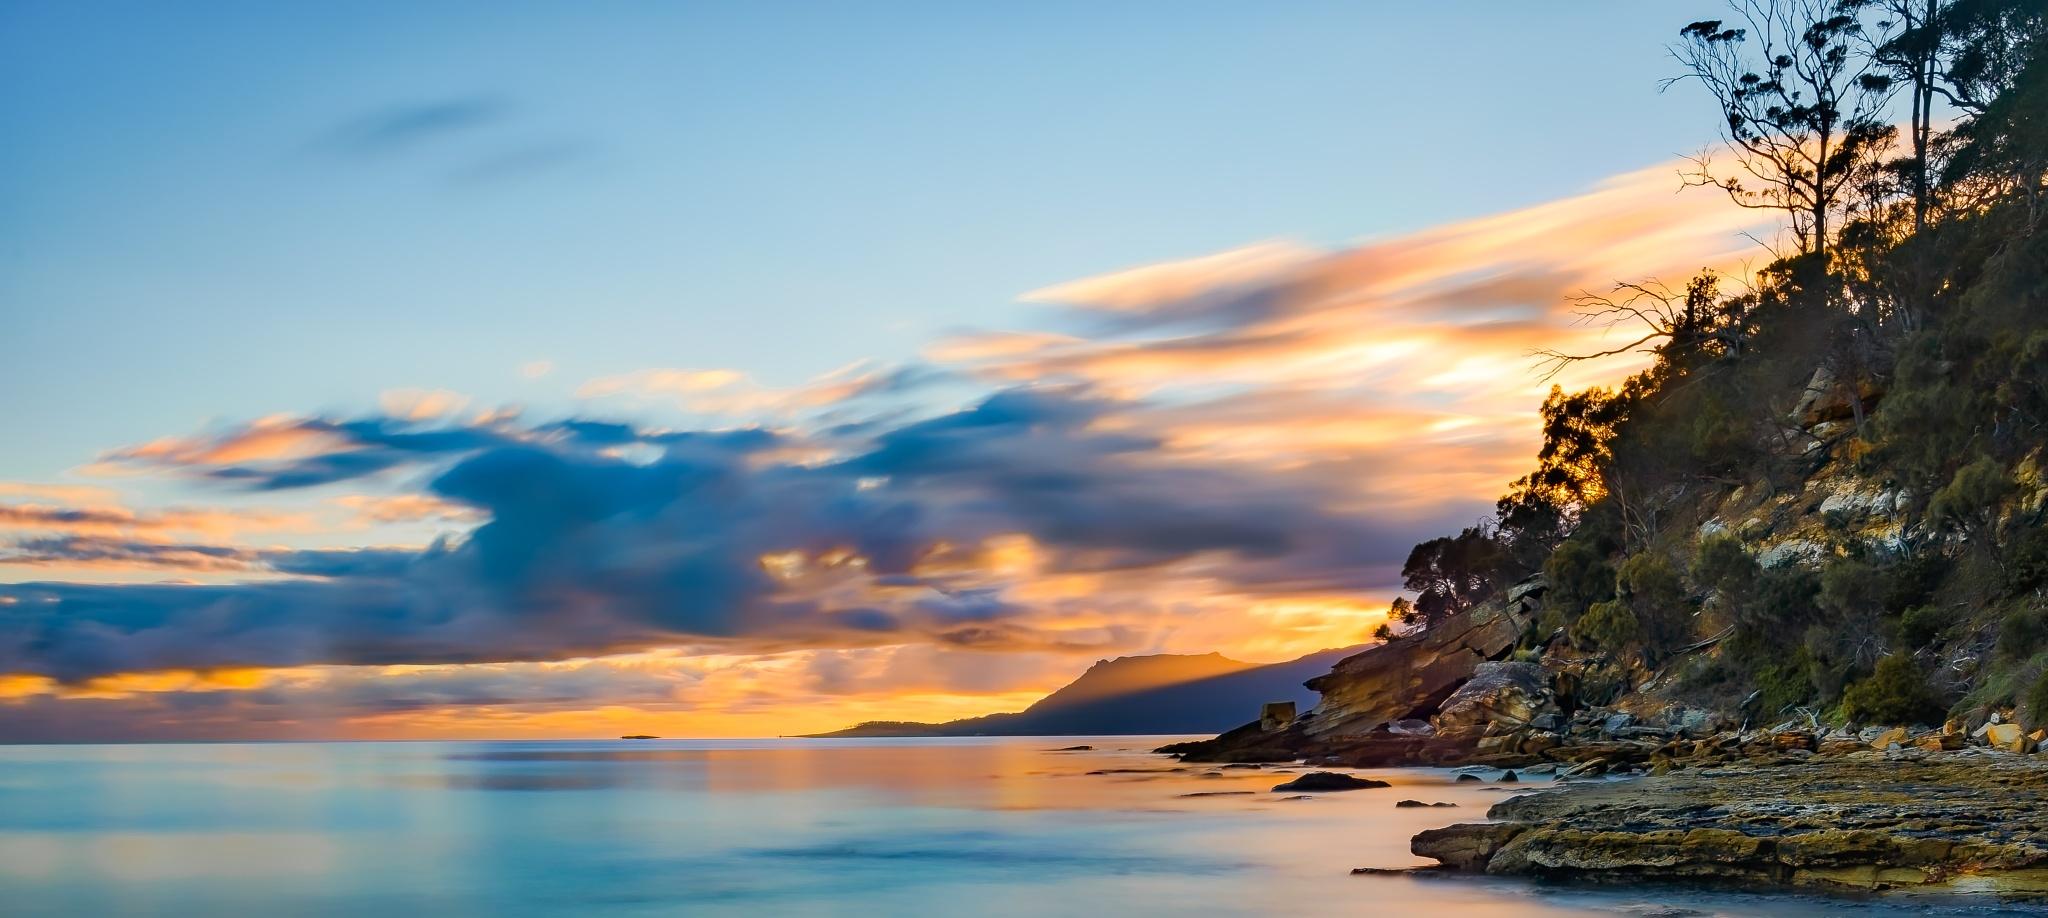 Photo in Landscape #landscape #beach #seascape #sunrise #ocean #sun #clouds #tasmania #australia